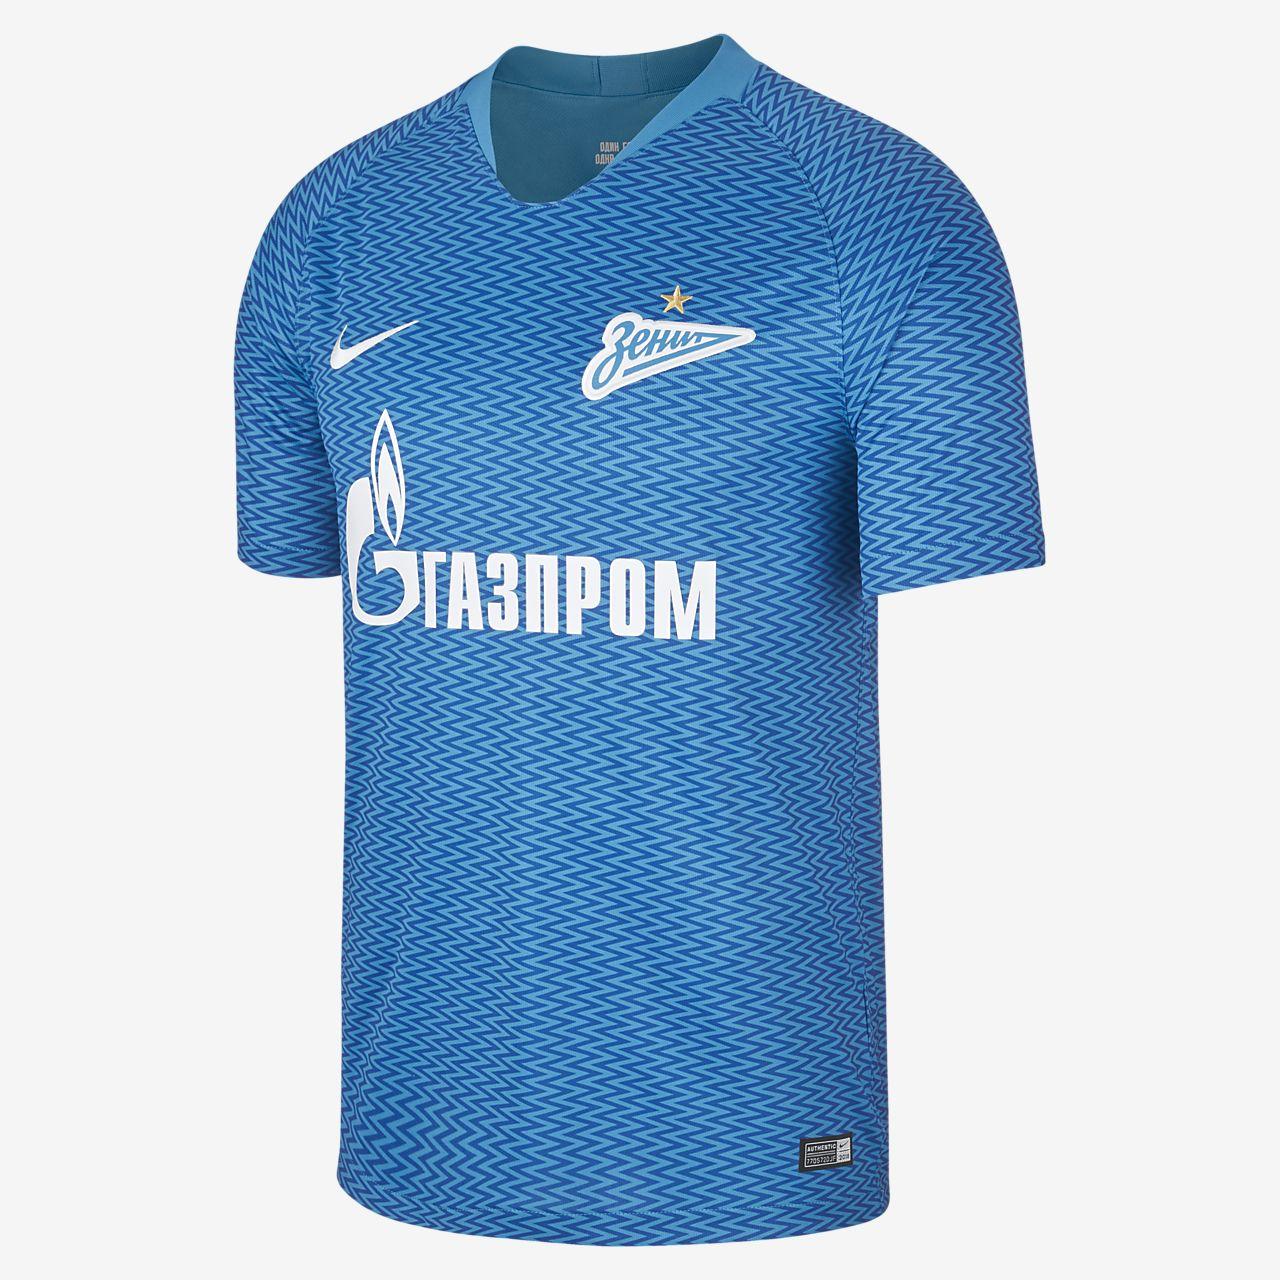 Maglia da calcio 2018/19 FC Zenit Stadium Home - Uomo